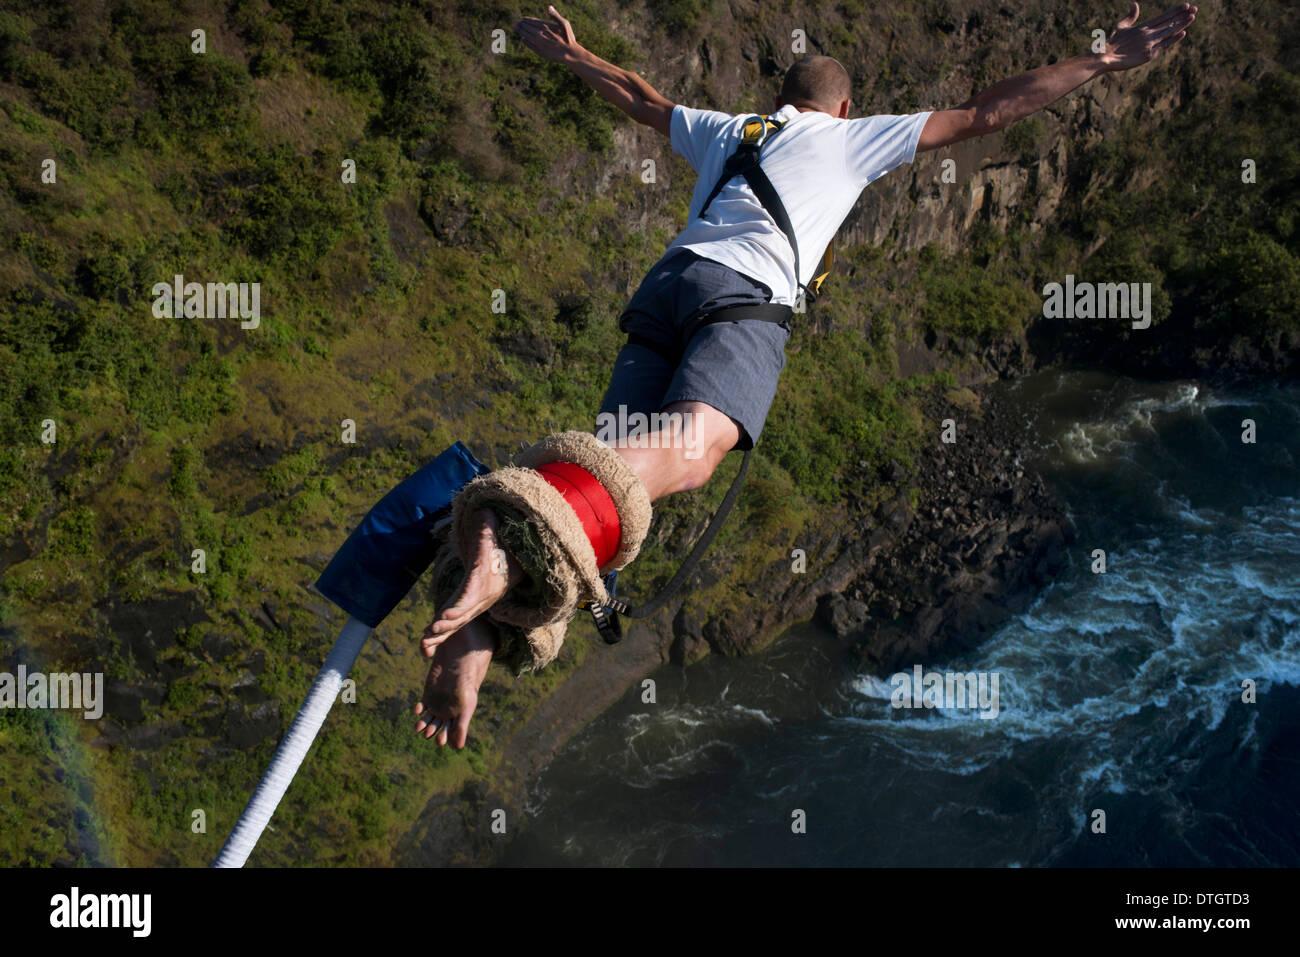 Victoria Falls Live Wallpaper Bungee Jumping At Victoria Falls Over Zambezi River